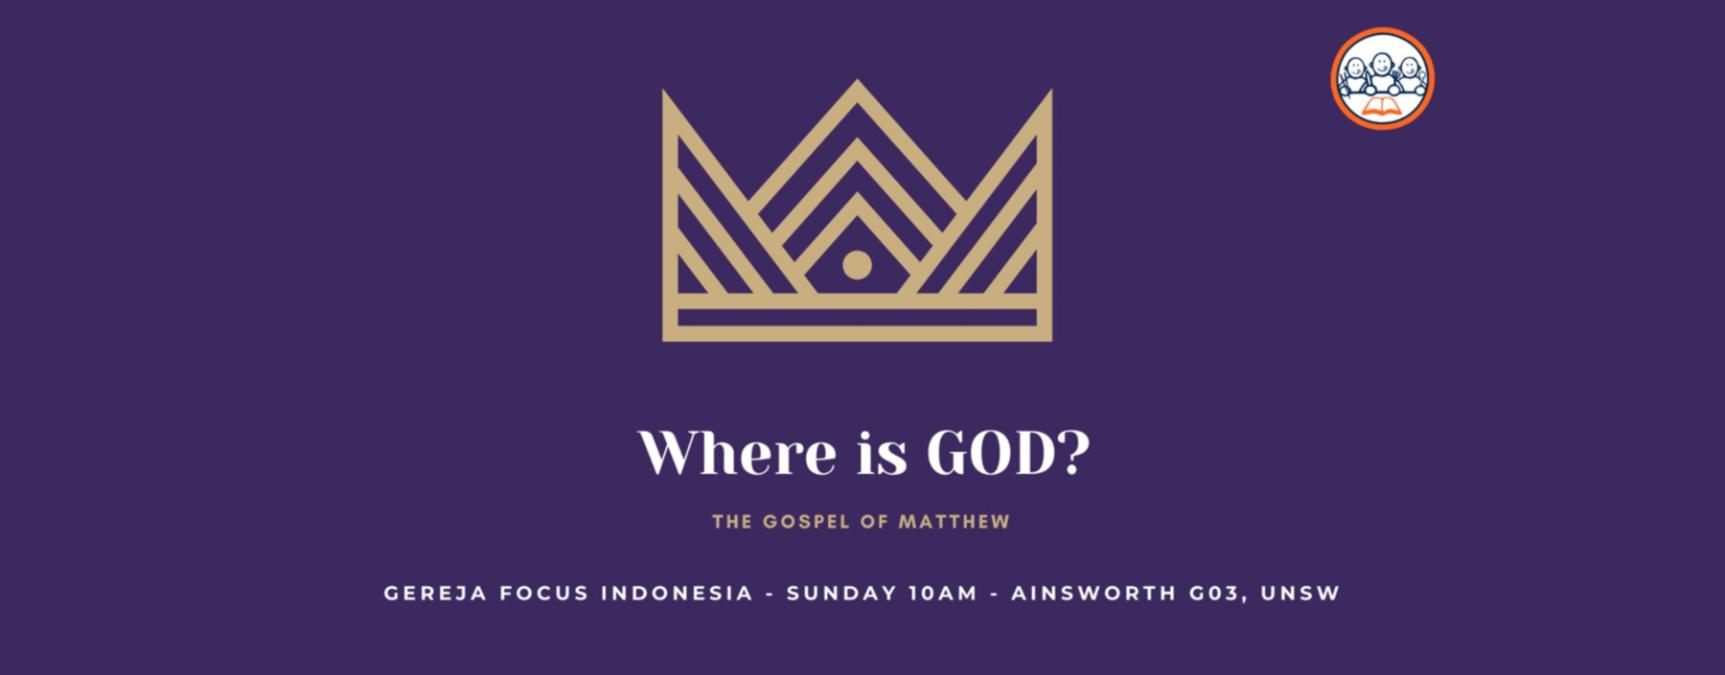 Sunday series: The Gospel of Matthew